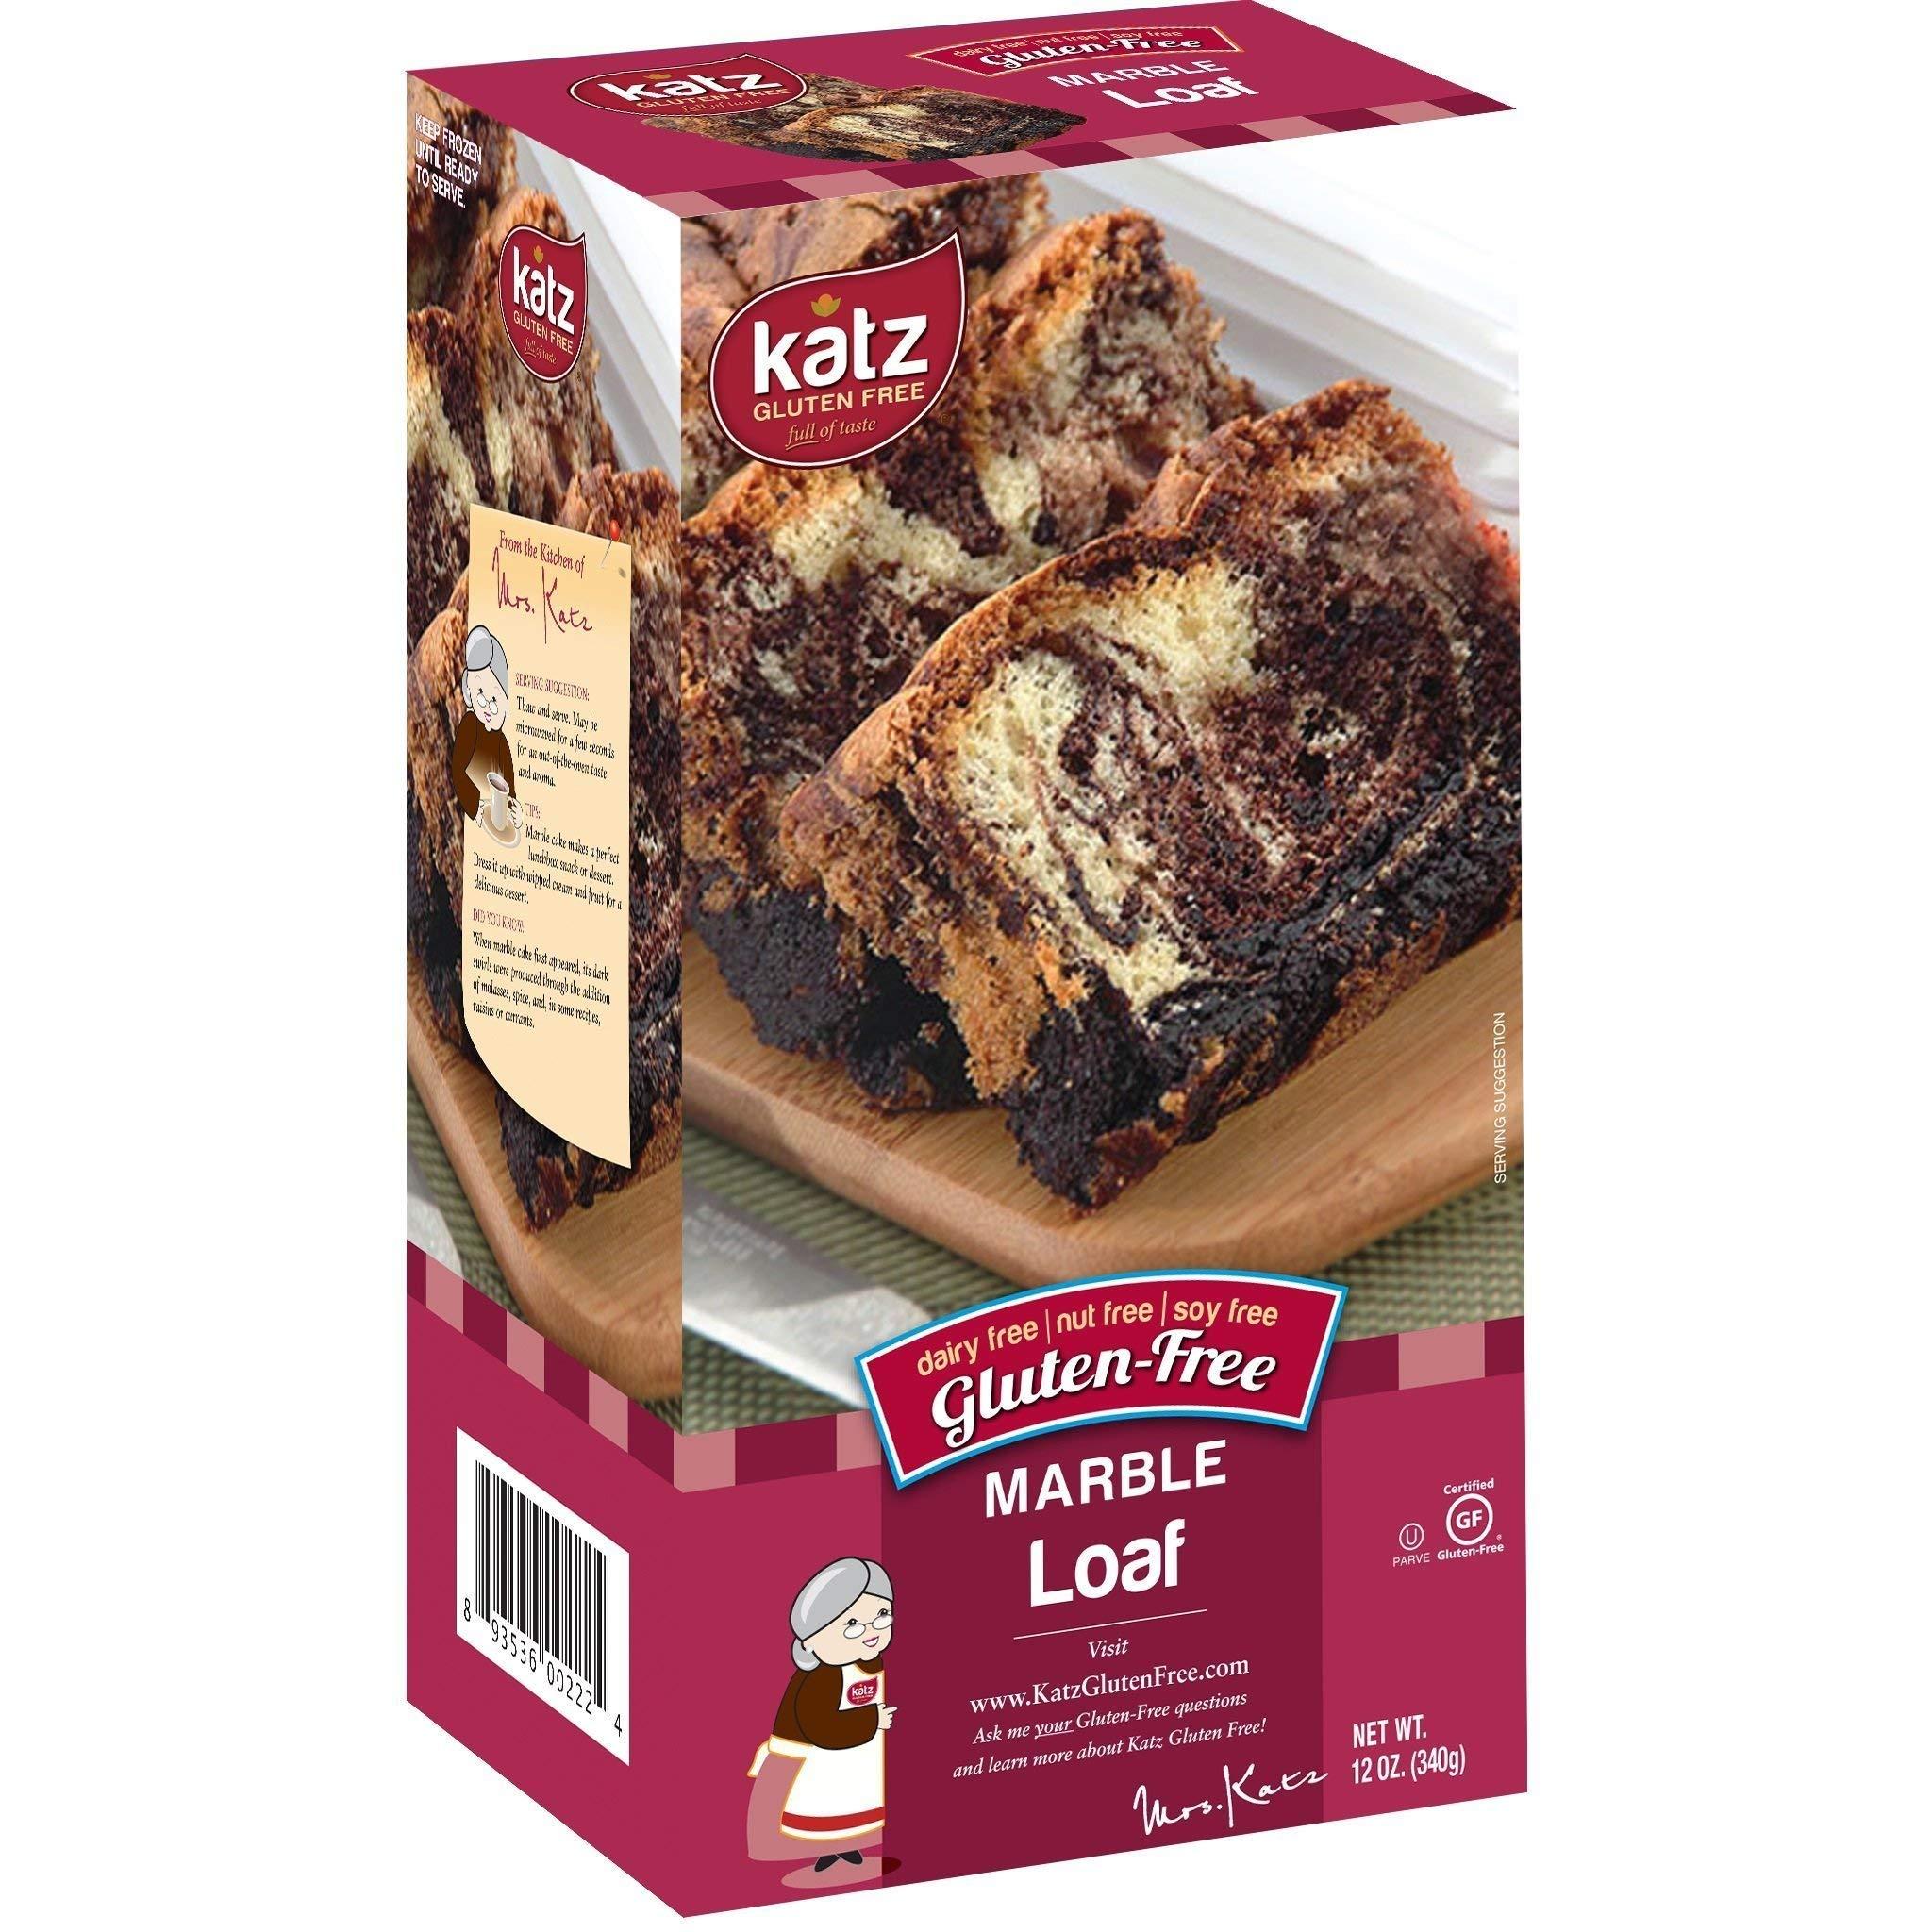 Katz Gluten Free Marble Loaf | Dairy, Nut, Soy & Gluten Free | Kosher 12 Oz (1 Pack)